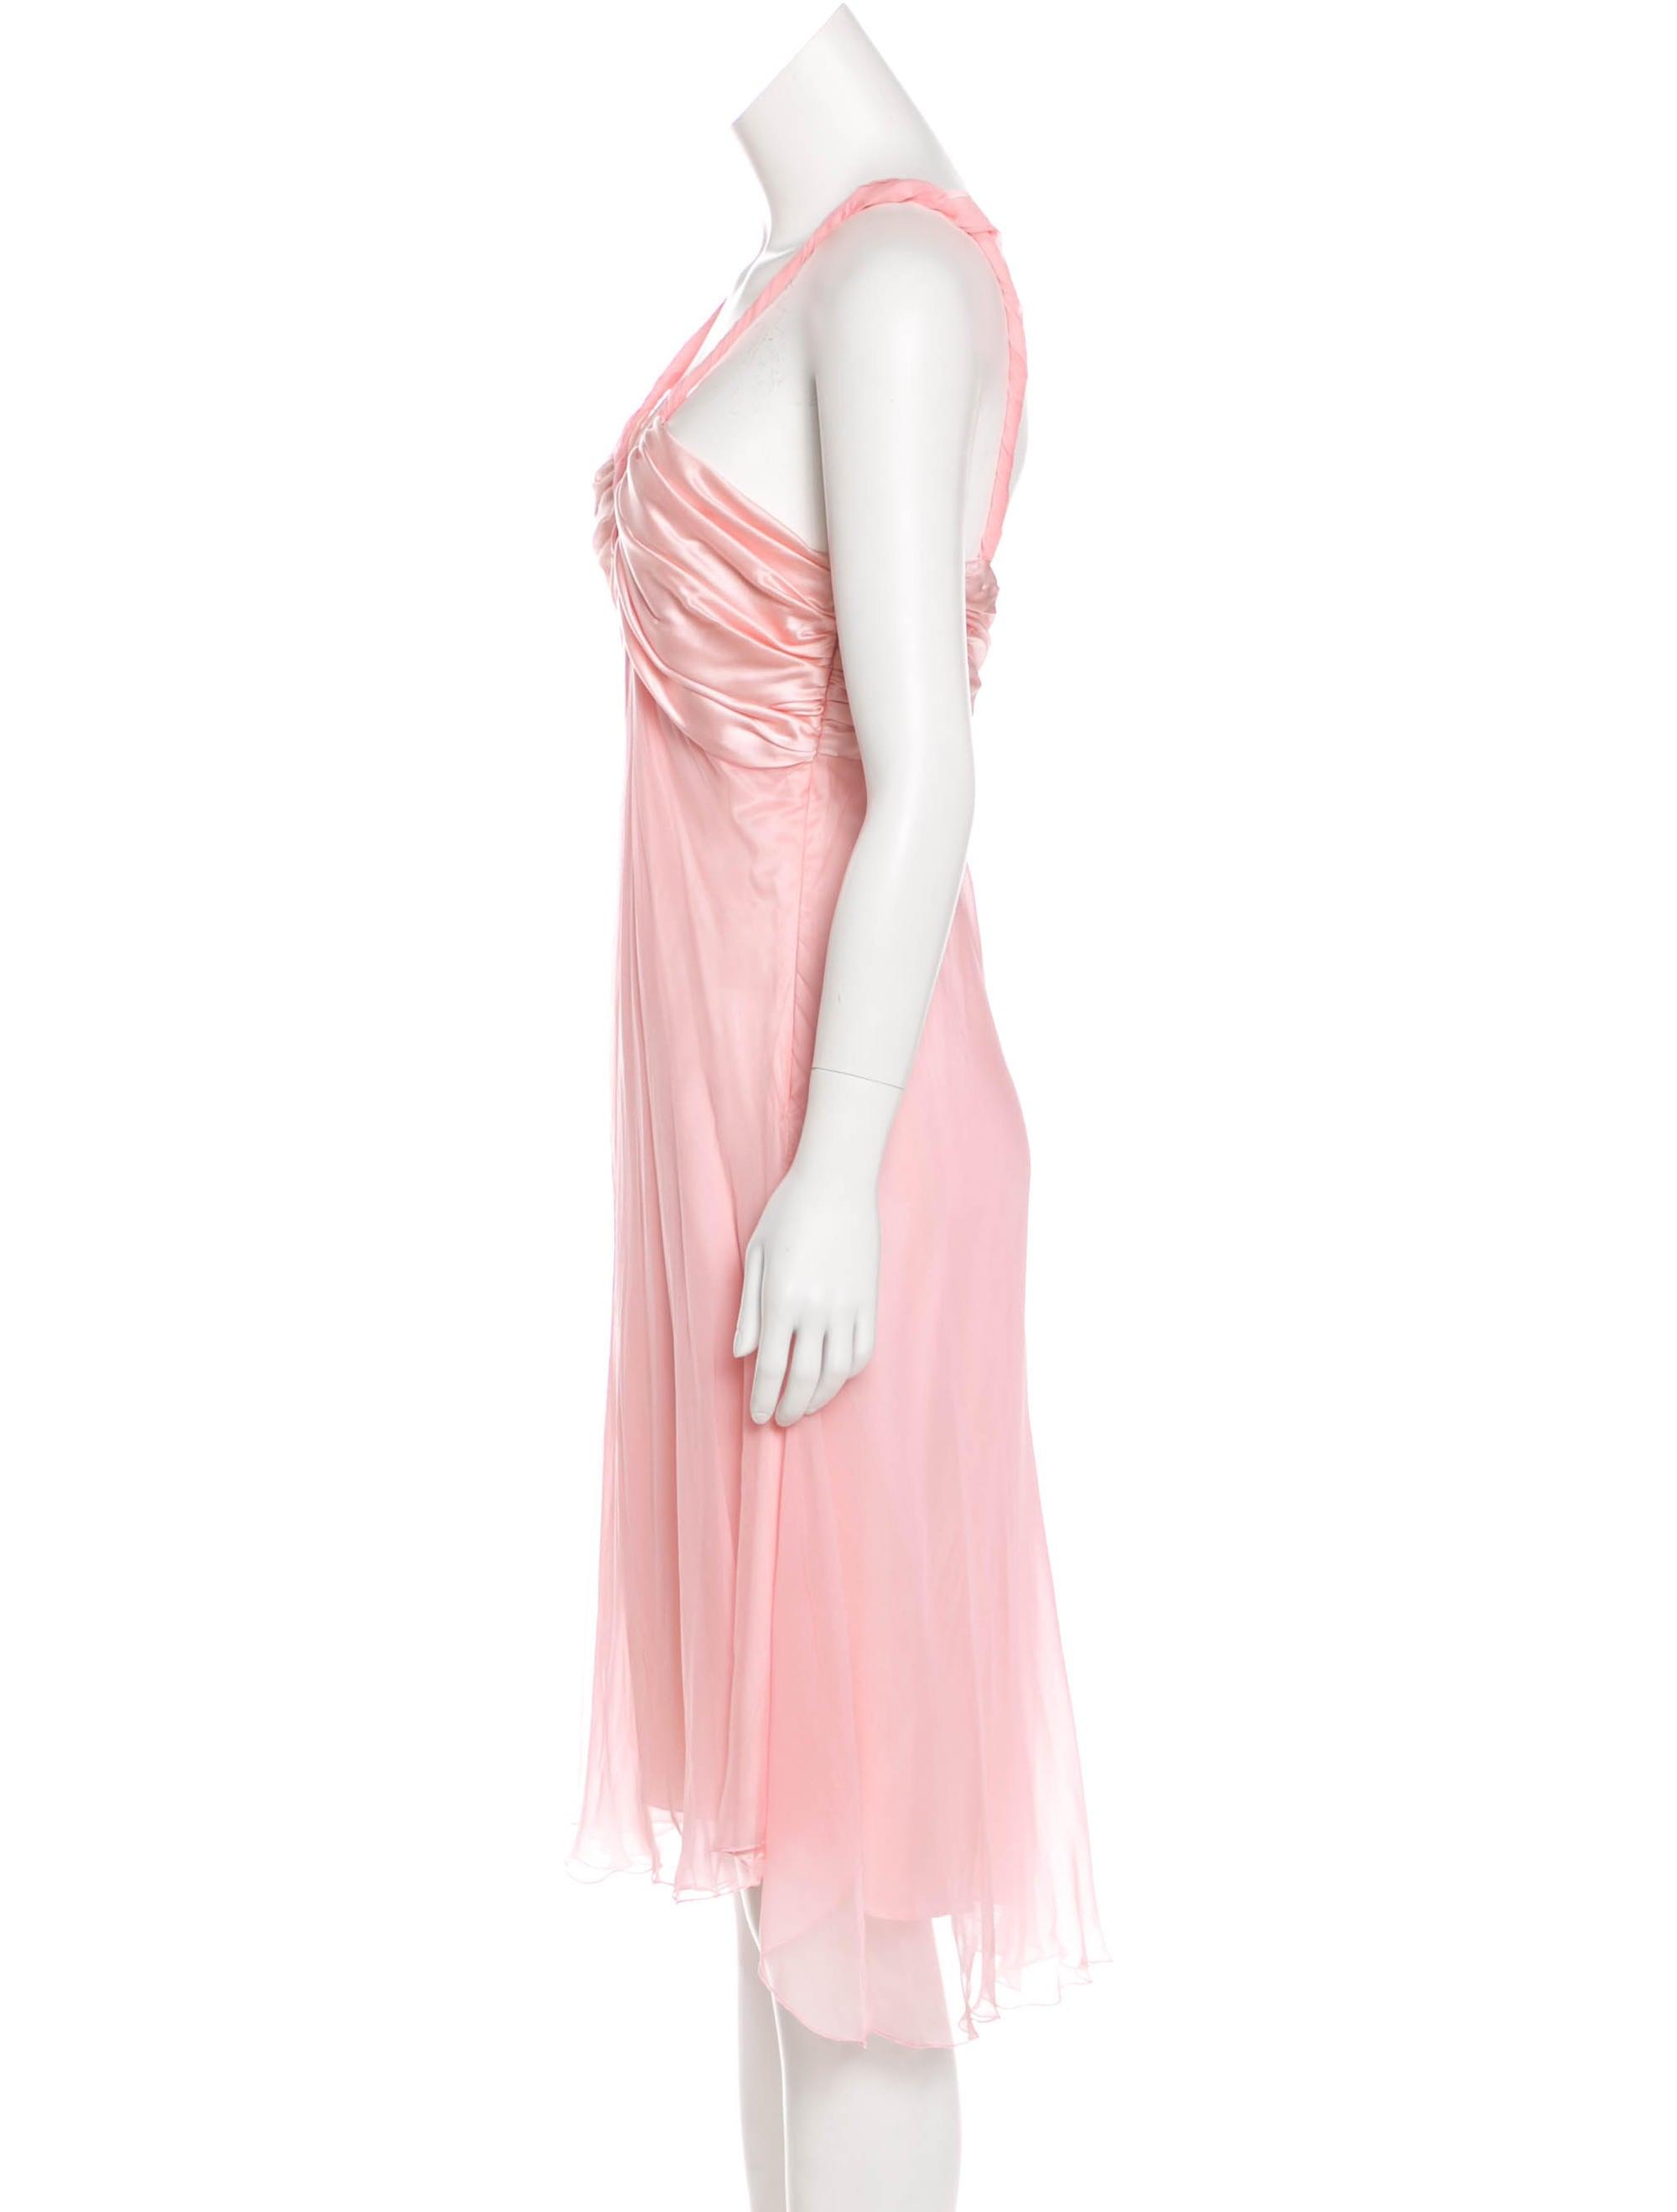 Rene Ruiz Sleeveless Midi Dress - Dresses - WRRUZ20003 | The RealReal